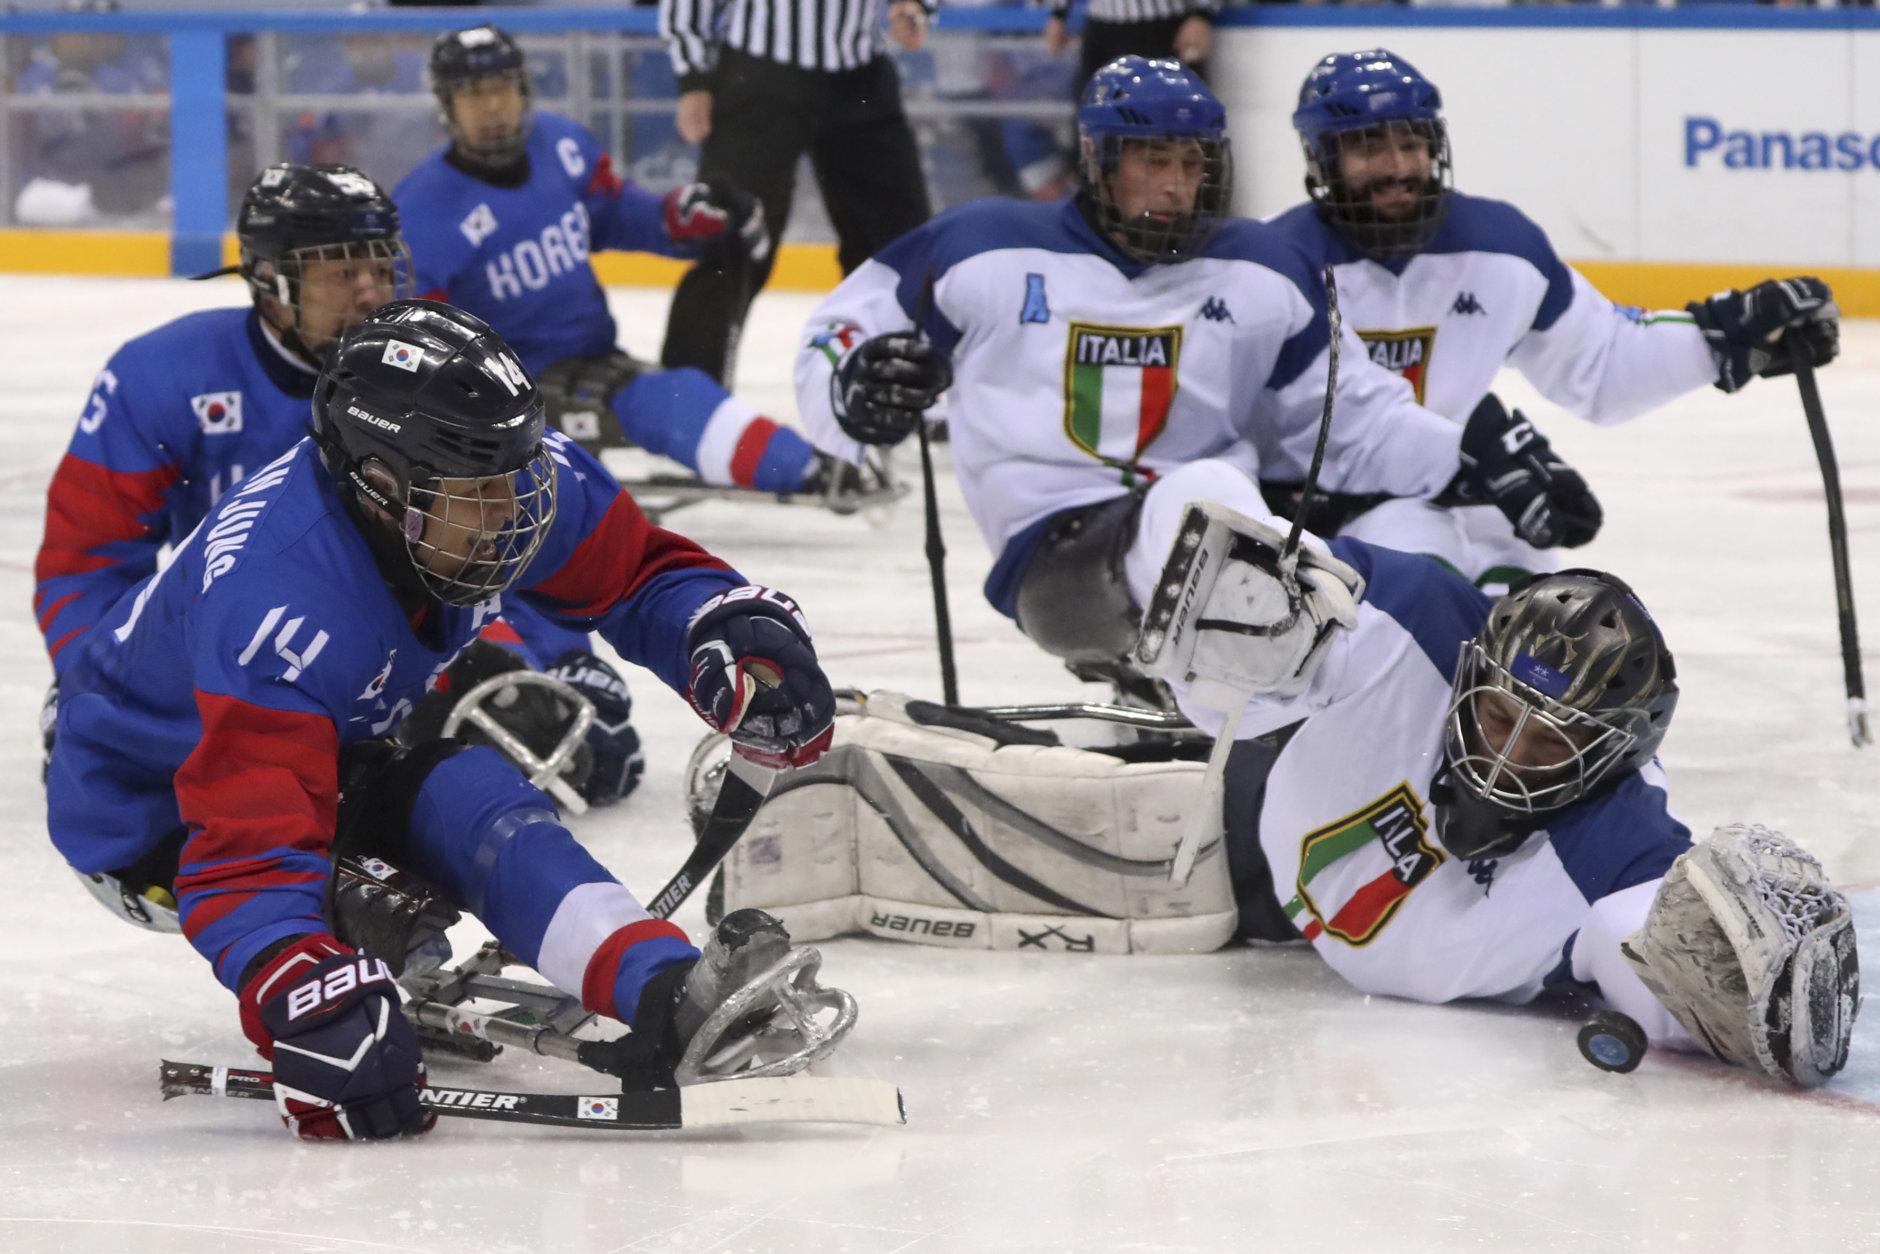 Italy's goalkeeper Gabriele Araudo blocks a shot from South Korea's Jung Seung-hwan during the bronze medal match of the 2018 Winter Paralympics at the Gangneung Hockey Center in Gangneung, South Korea, Saturday, March 17, 2018. (AP Photo/Ng Han Guan)